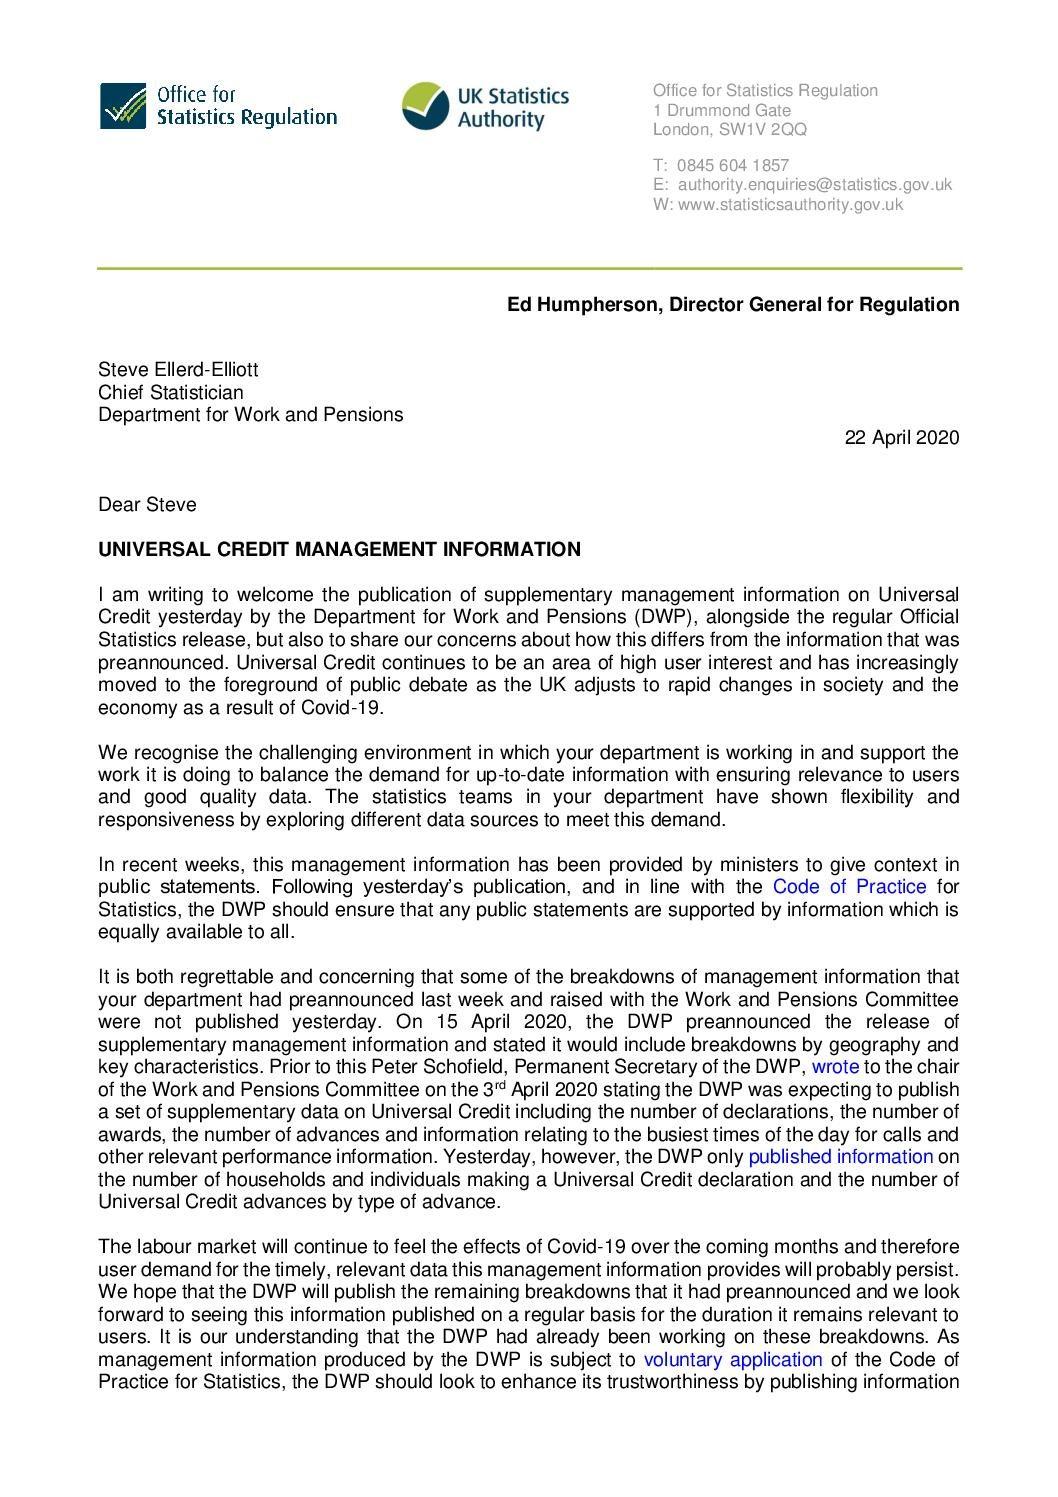 Ed Humpherson to Steve Ellerd-Elliott: Universal Credit management information